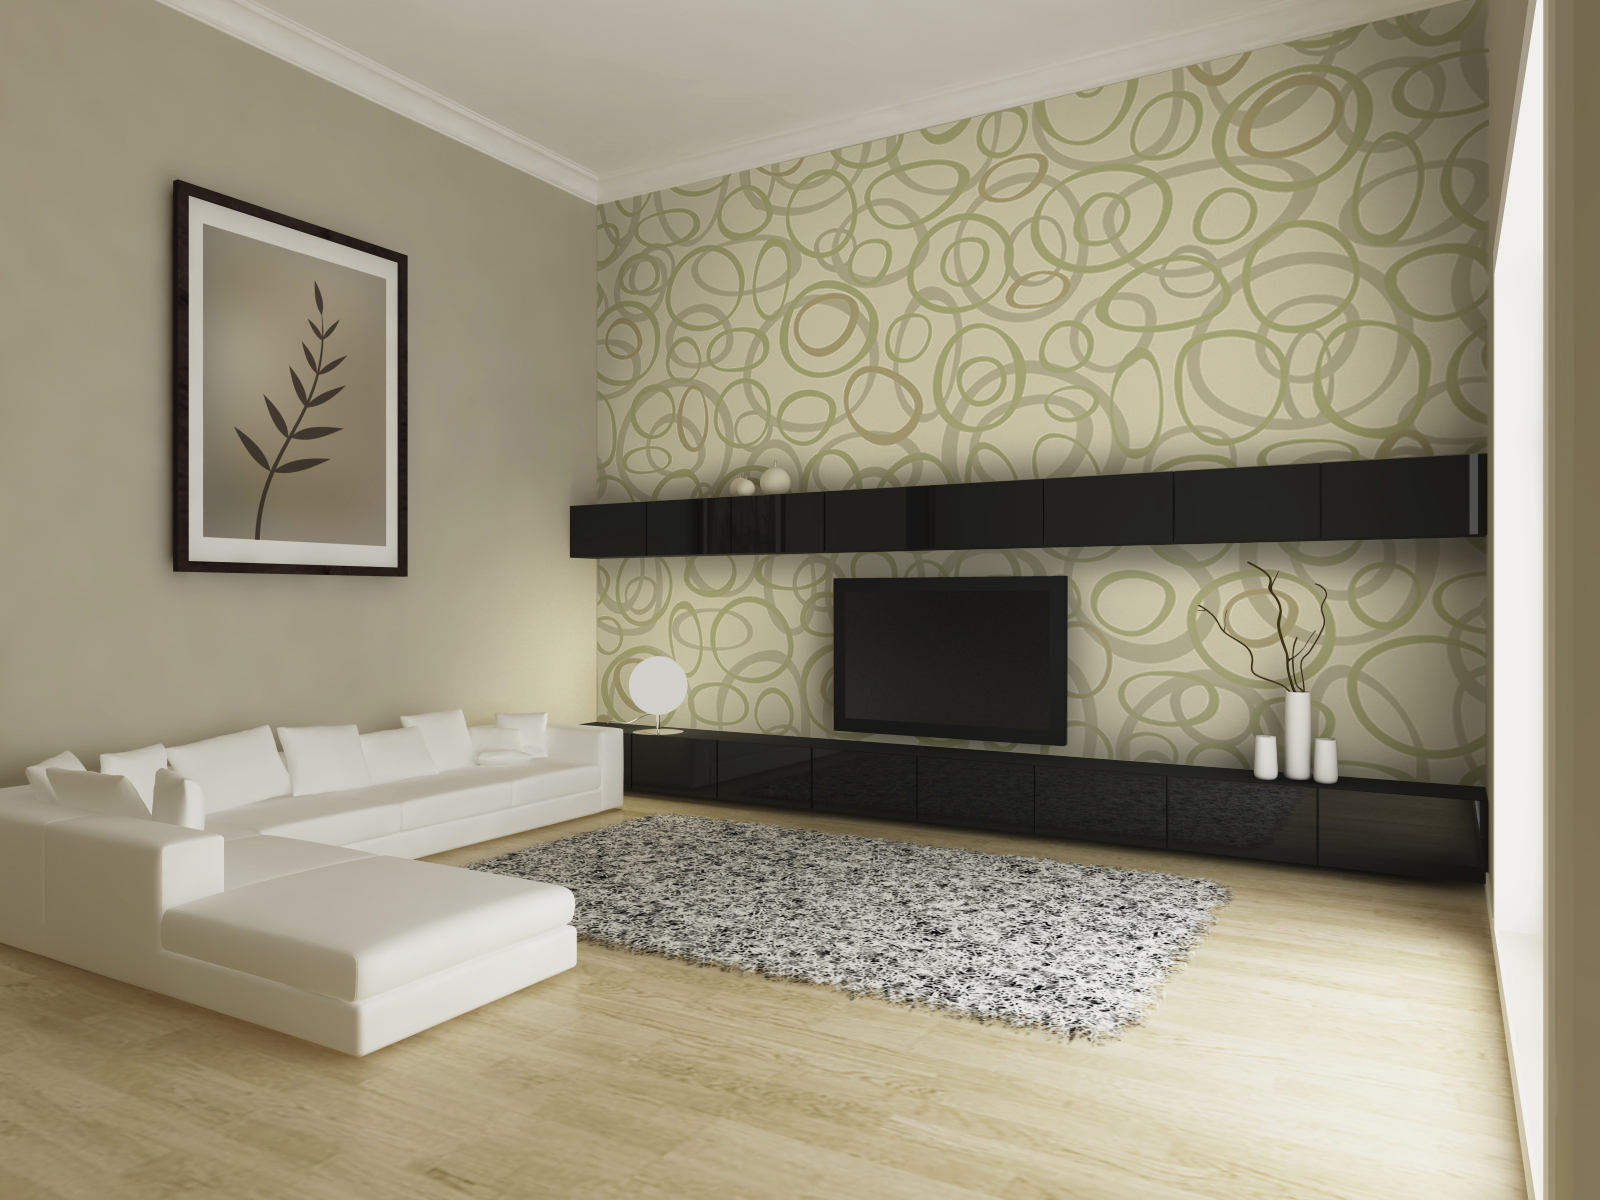 wallpaper interior design india photo - 7